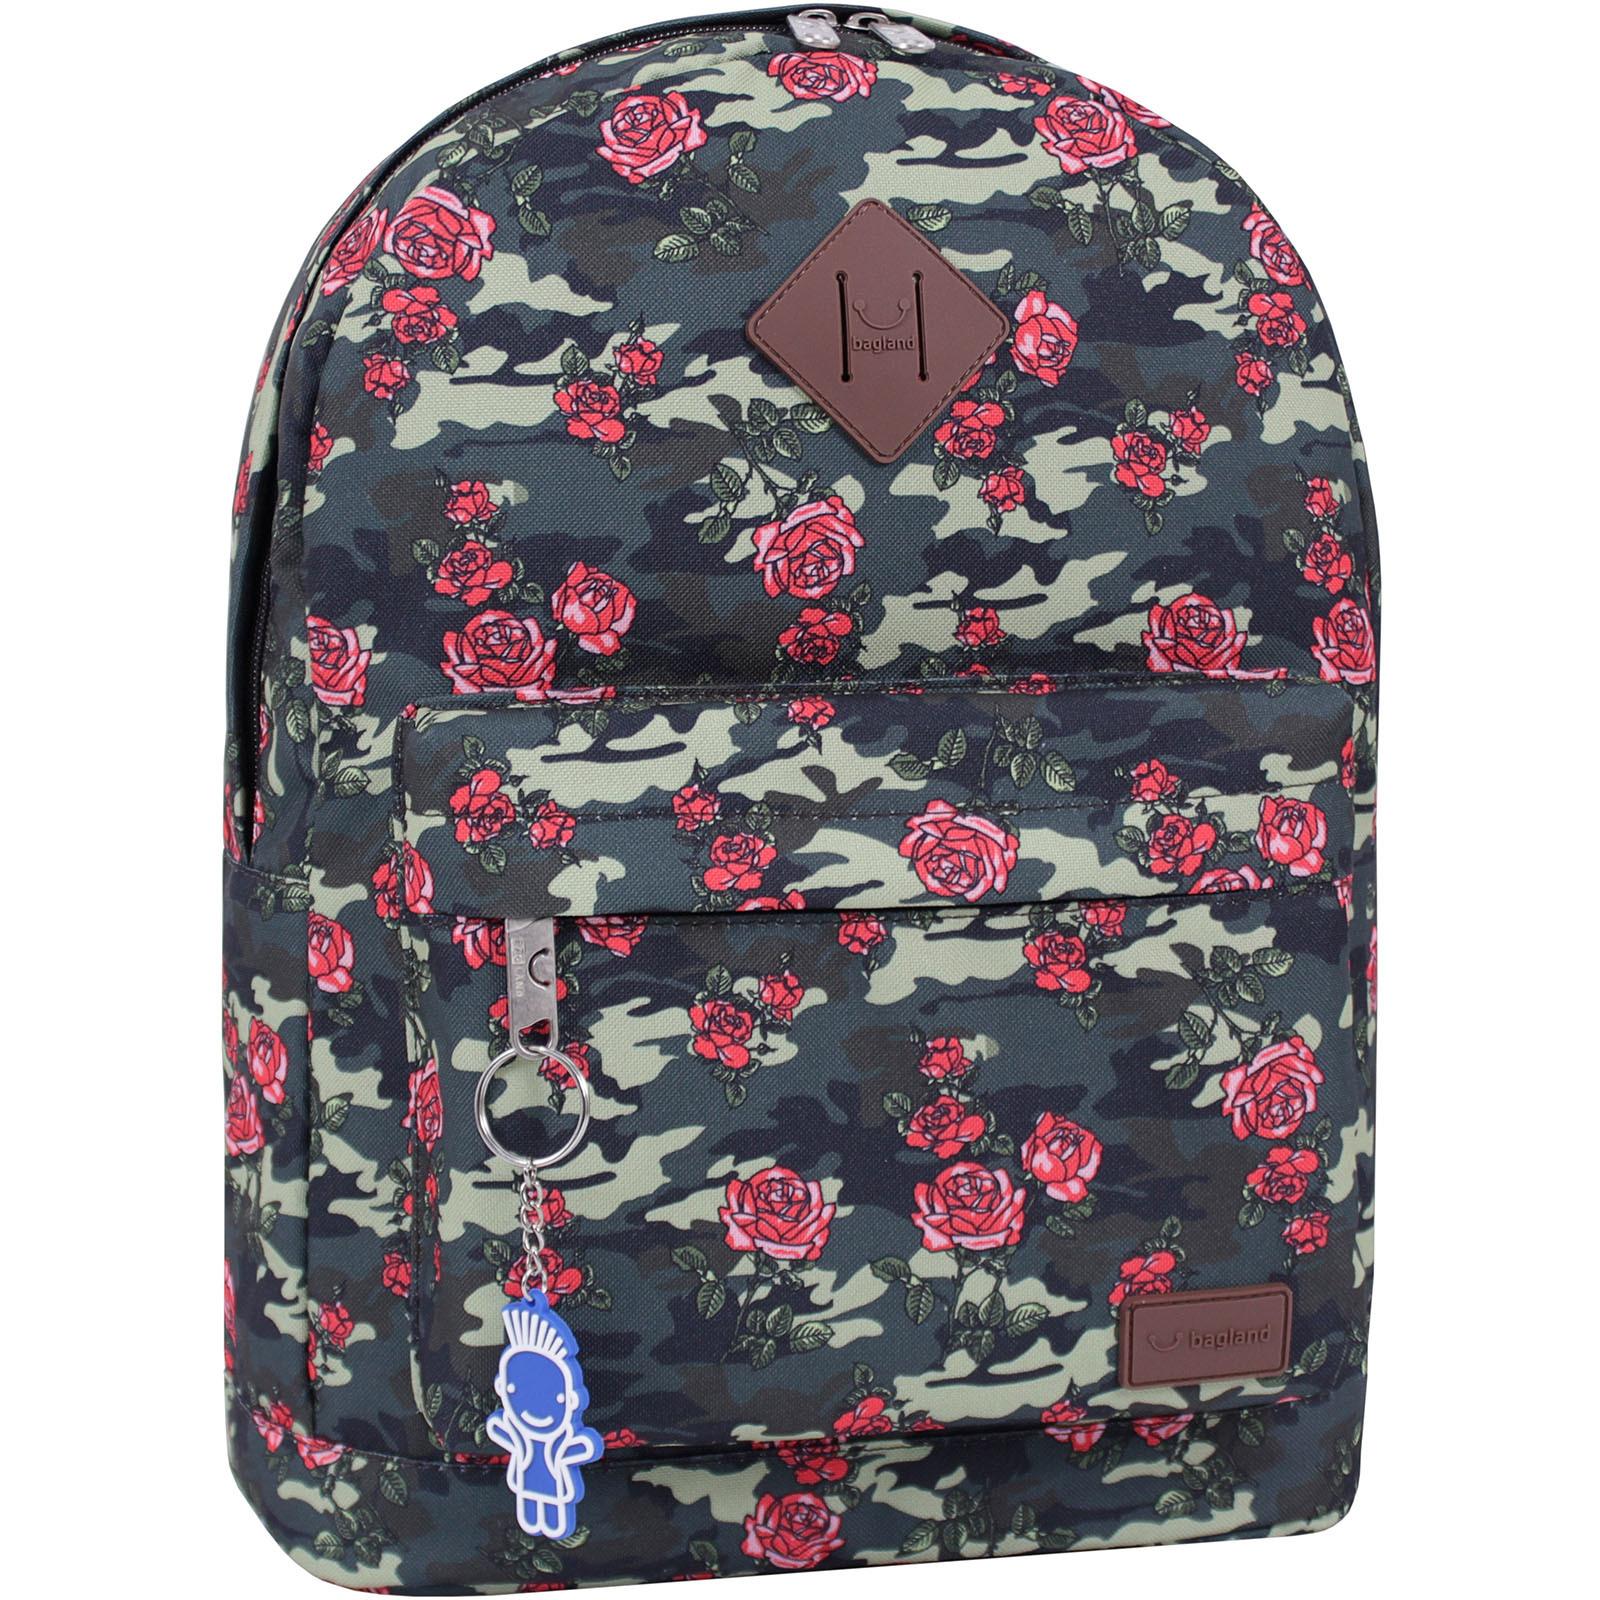 Городские рюкзаки Рюкзак Bagland Молодежный 17 л. сублимация 470 (00533664) IMG_9517_суб.470_.JPG